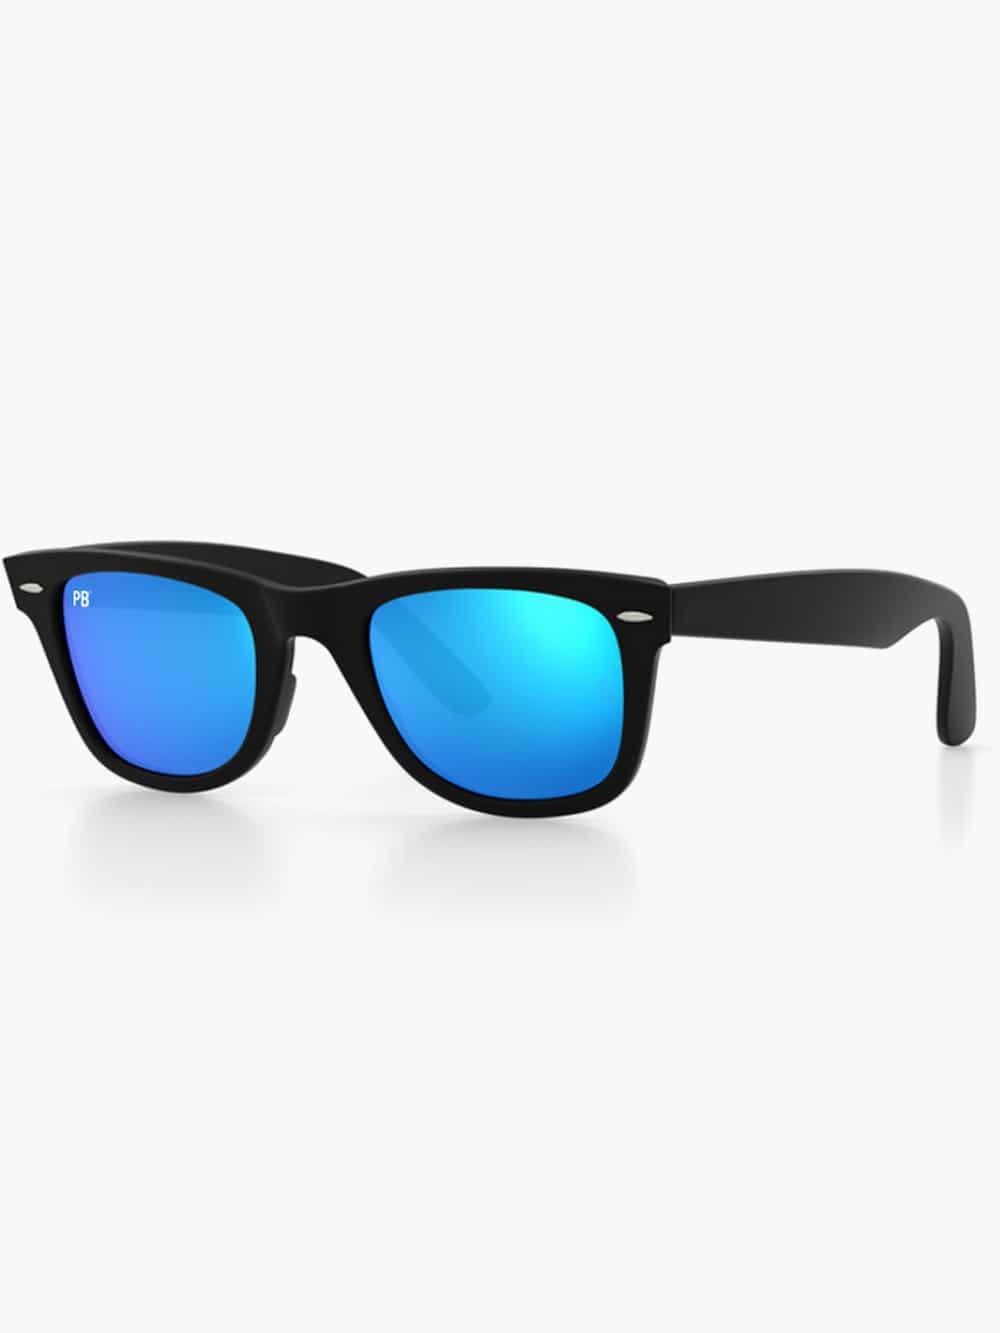 wayfarer-matte-blue-flash-side